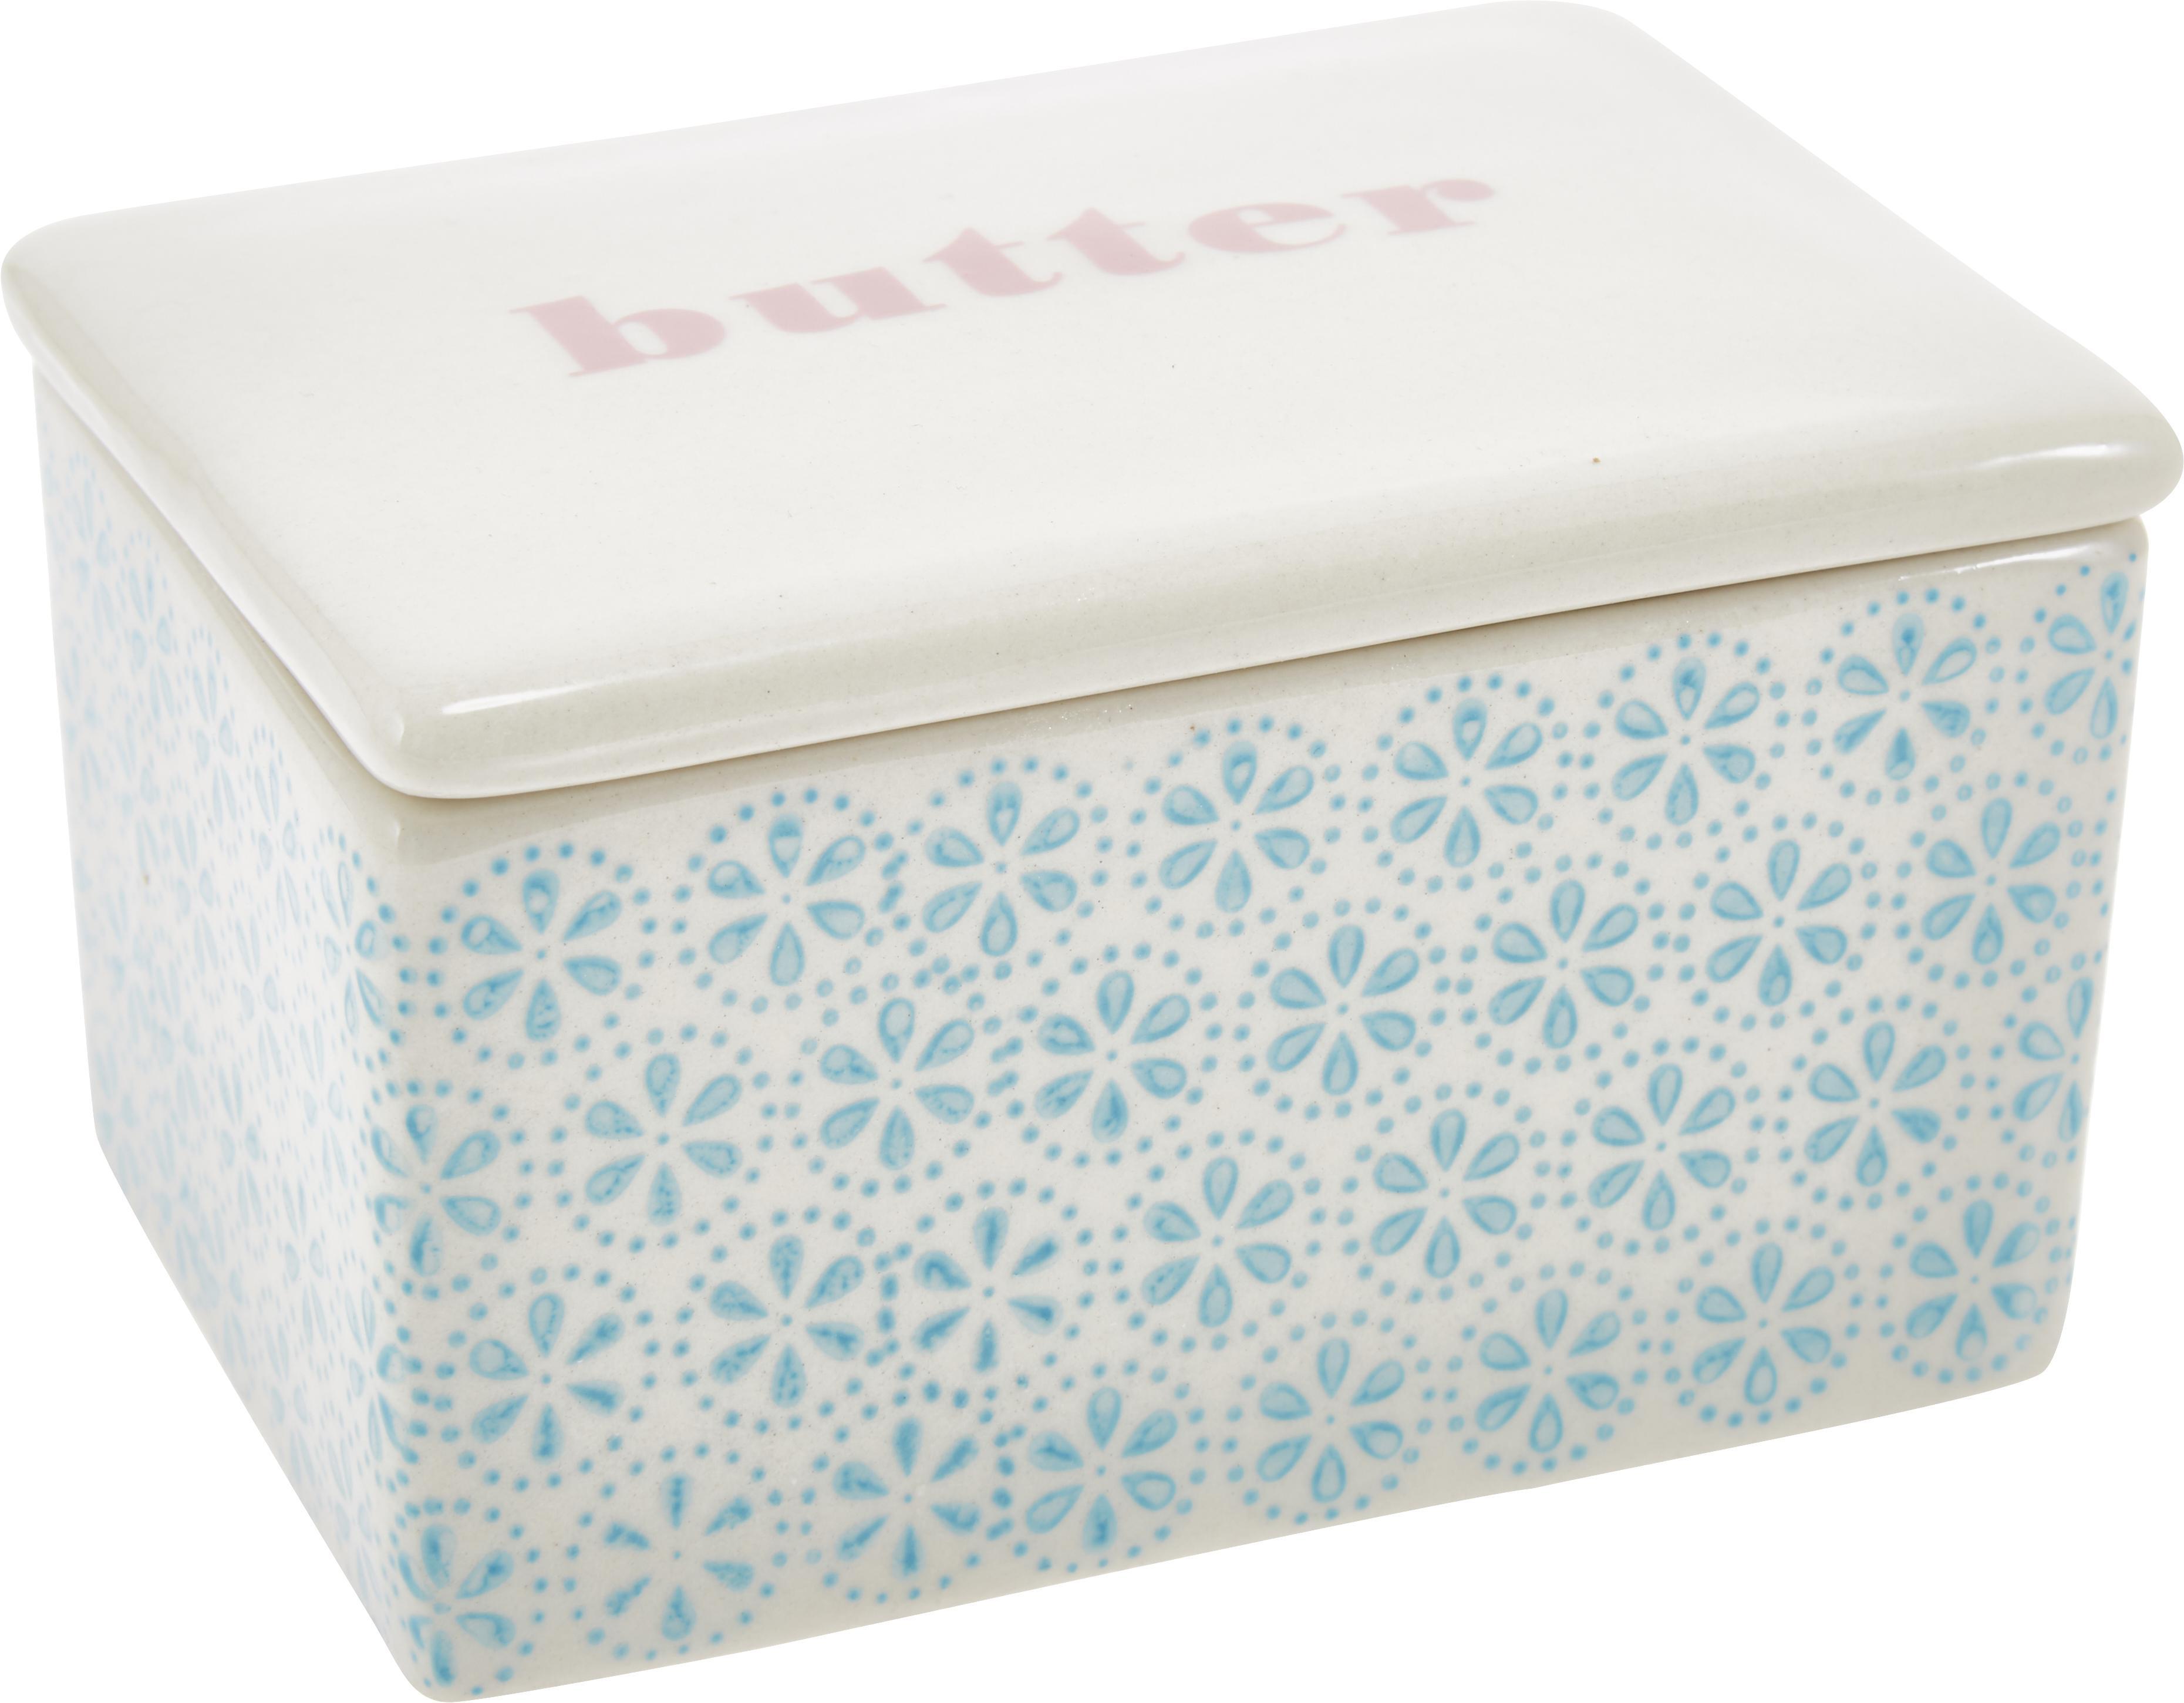 Botervloot Patrizia, Steengoed, Beige, blauw, roze, 13 x 7 cm